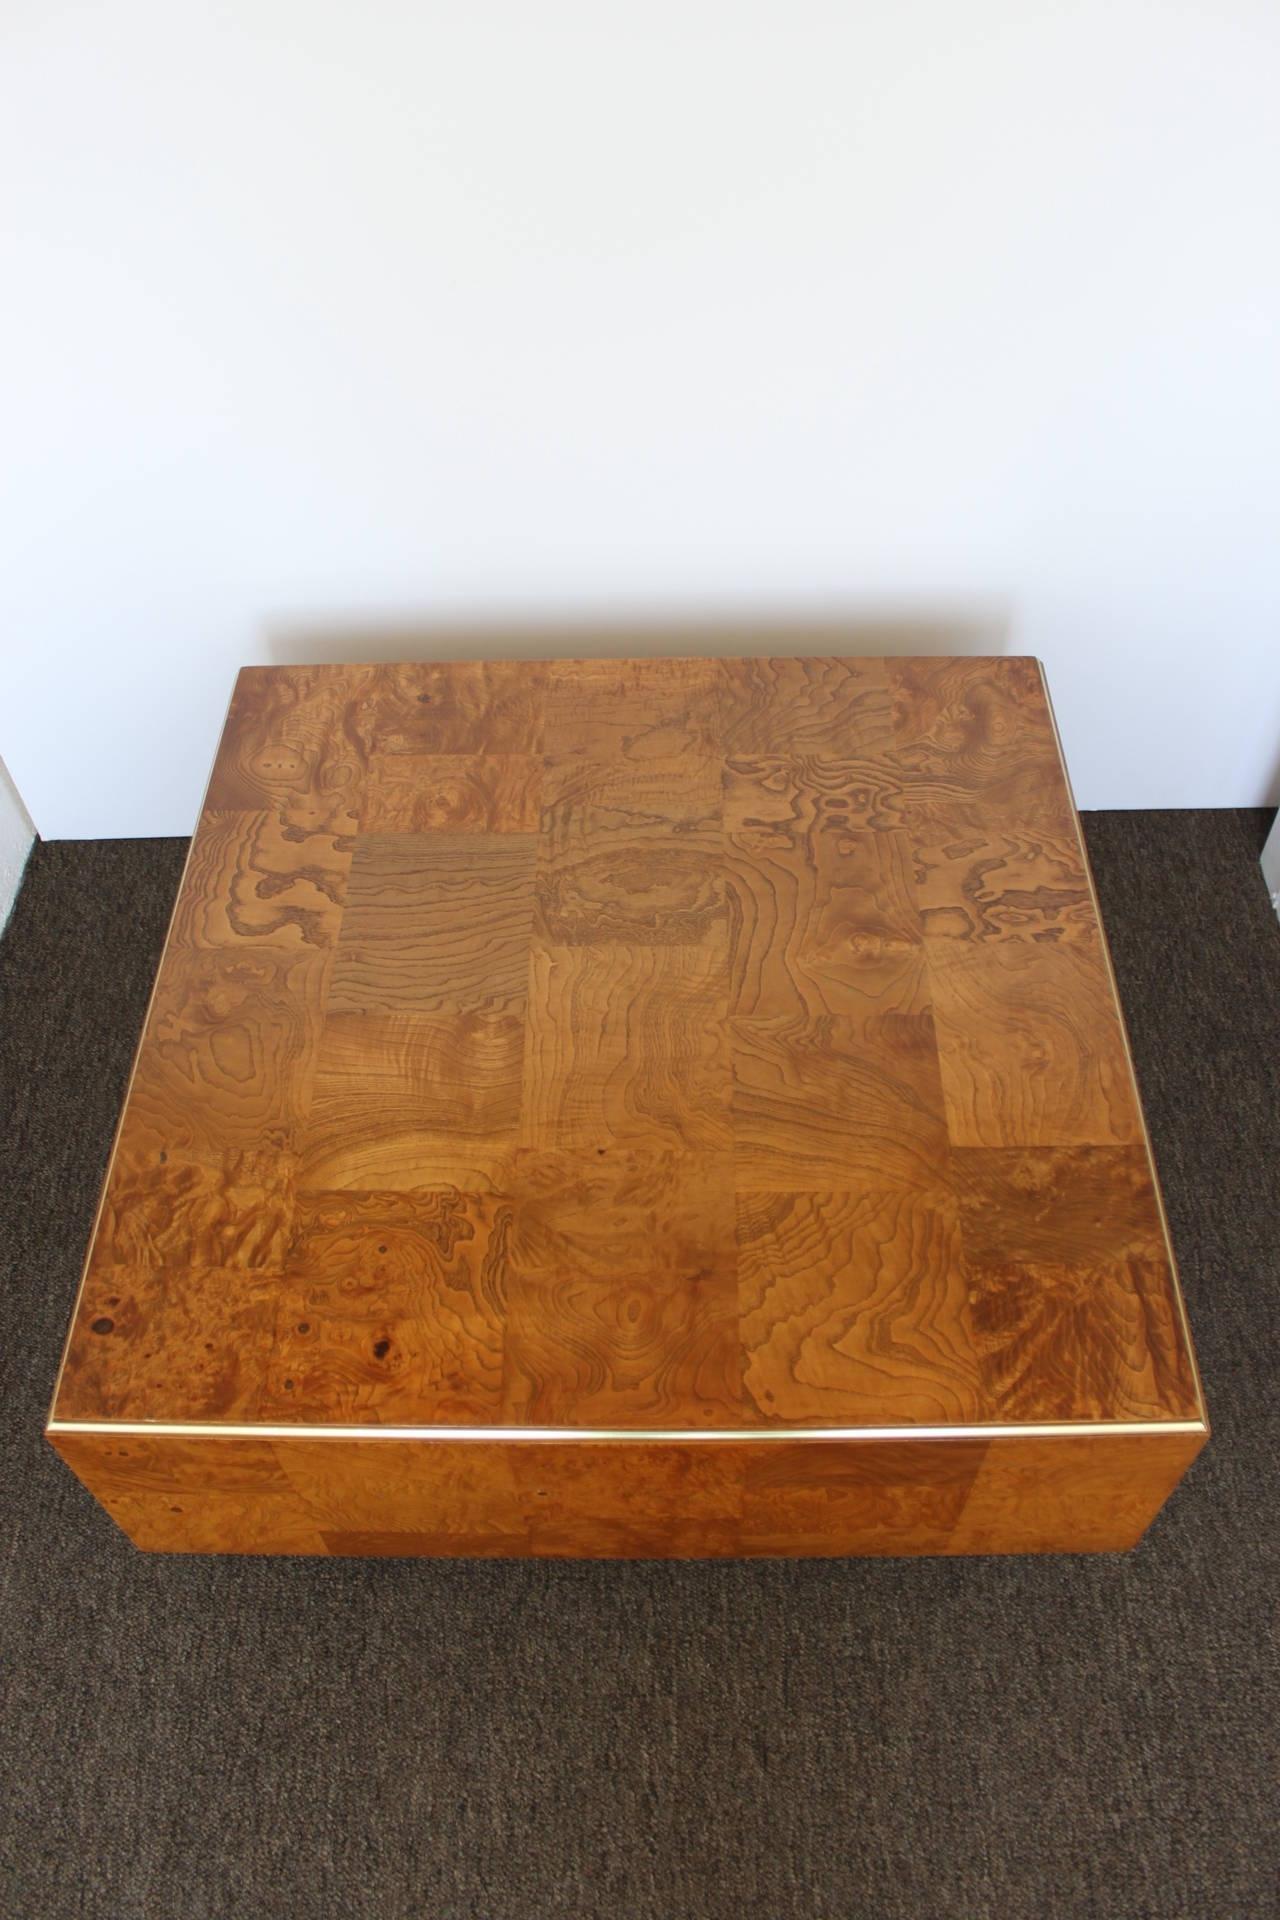 Lovely Burled Wood Coffee Table - Sarjaopas | Sarjaopas in Joni Brass And Wood Coffee Tables (Image 22 of 30)